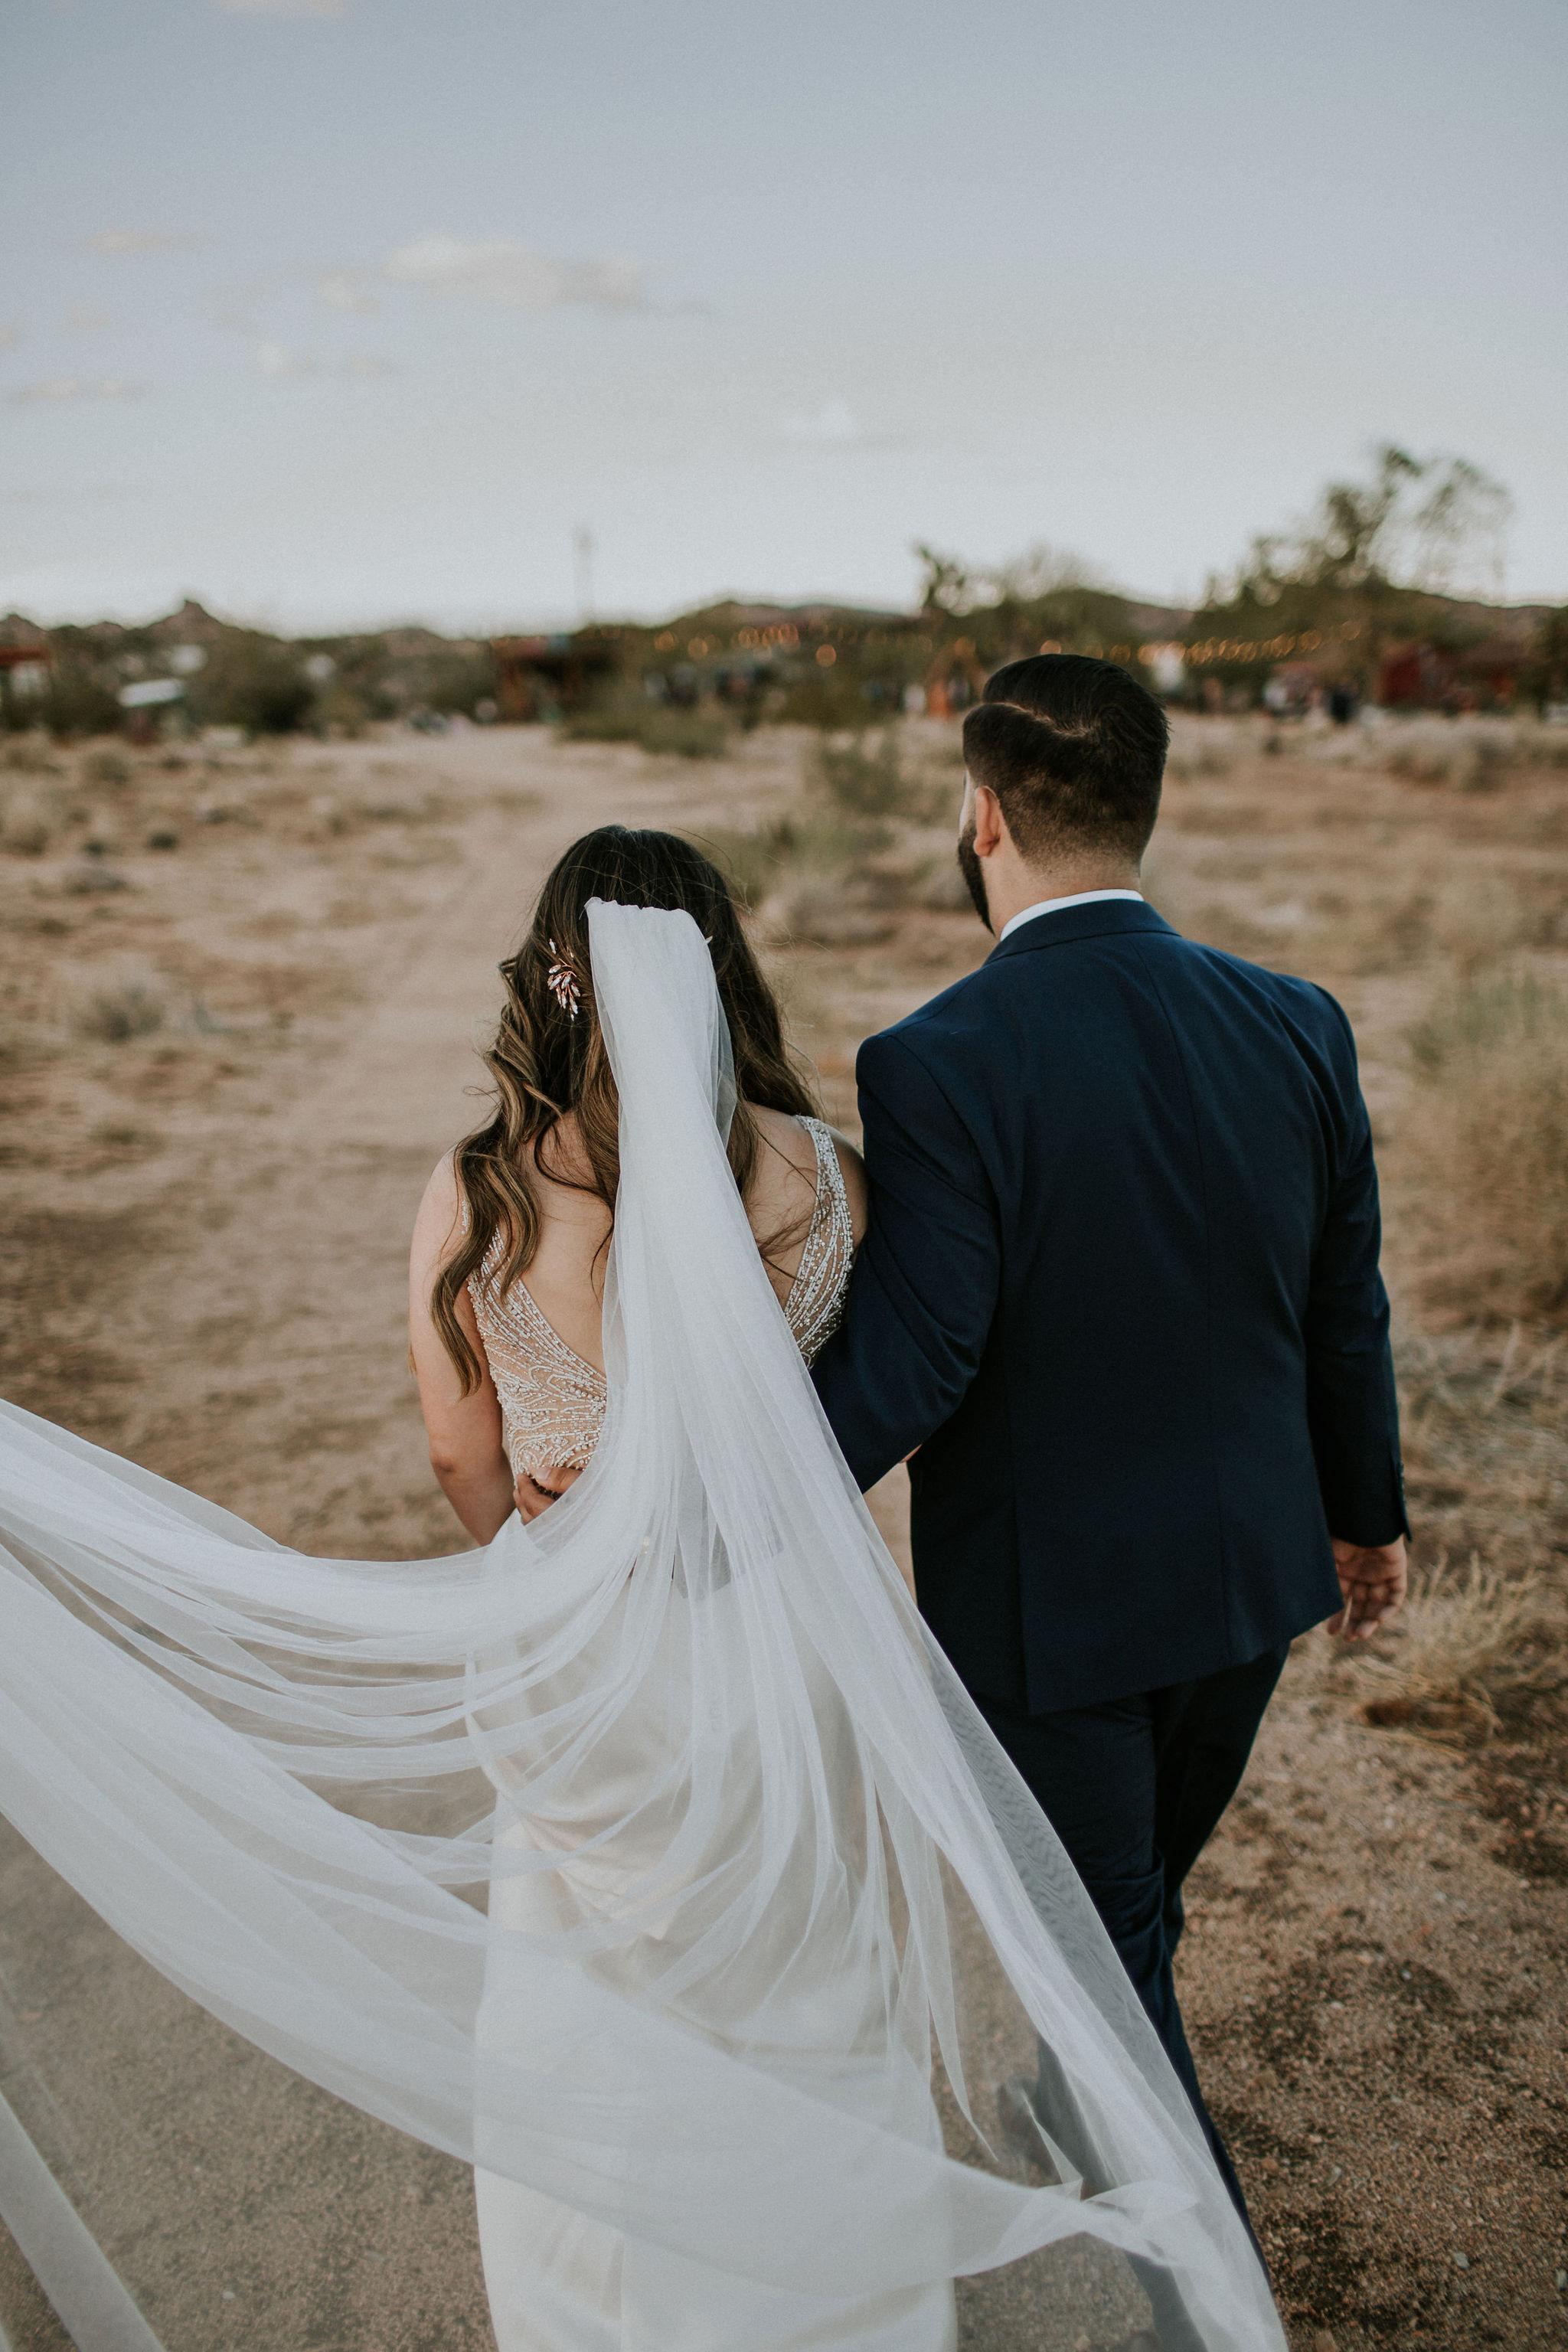 RimrockRanch-JoshuaTree-Wedding-Jami-Laree-670.jpg